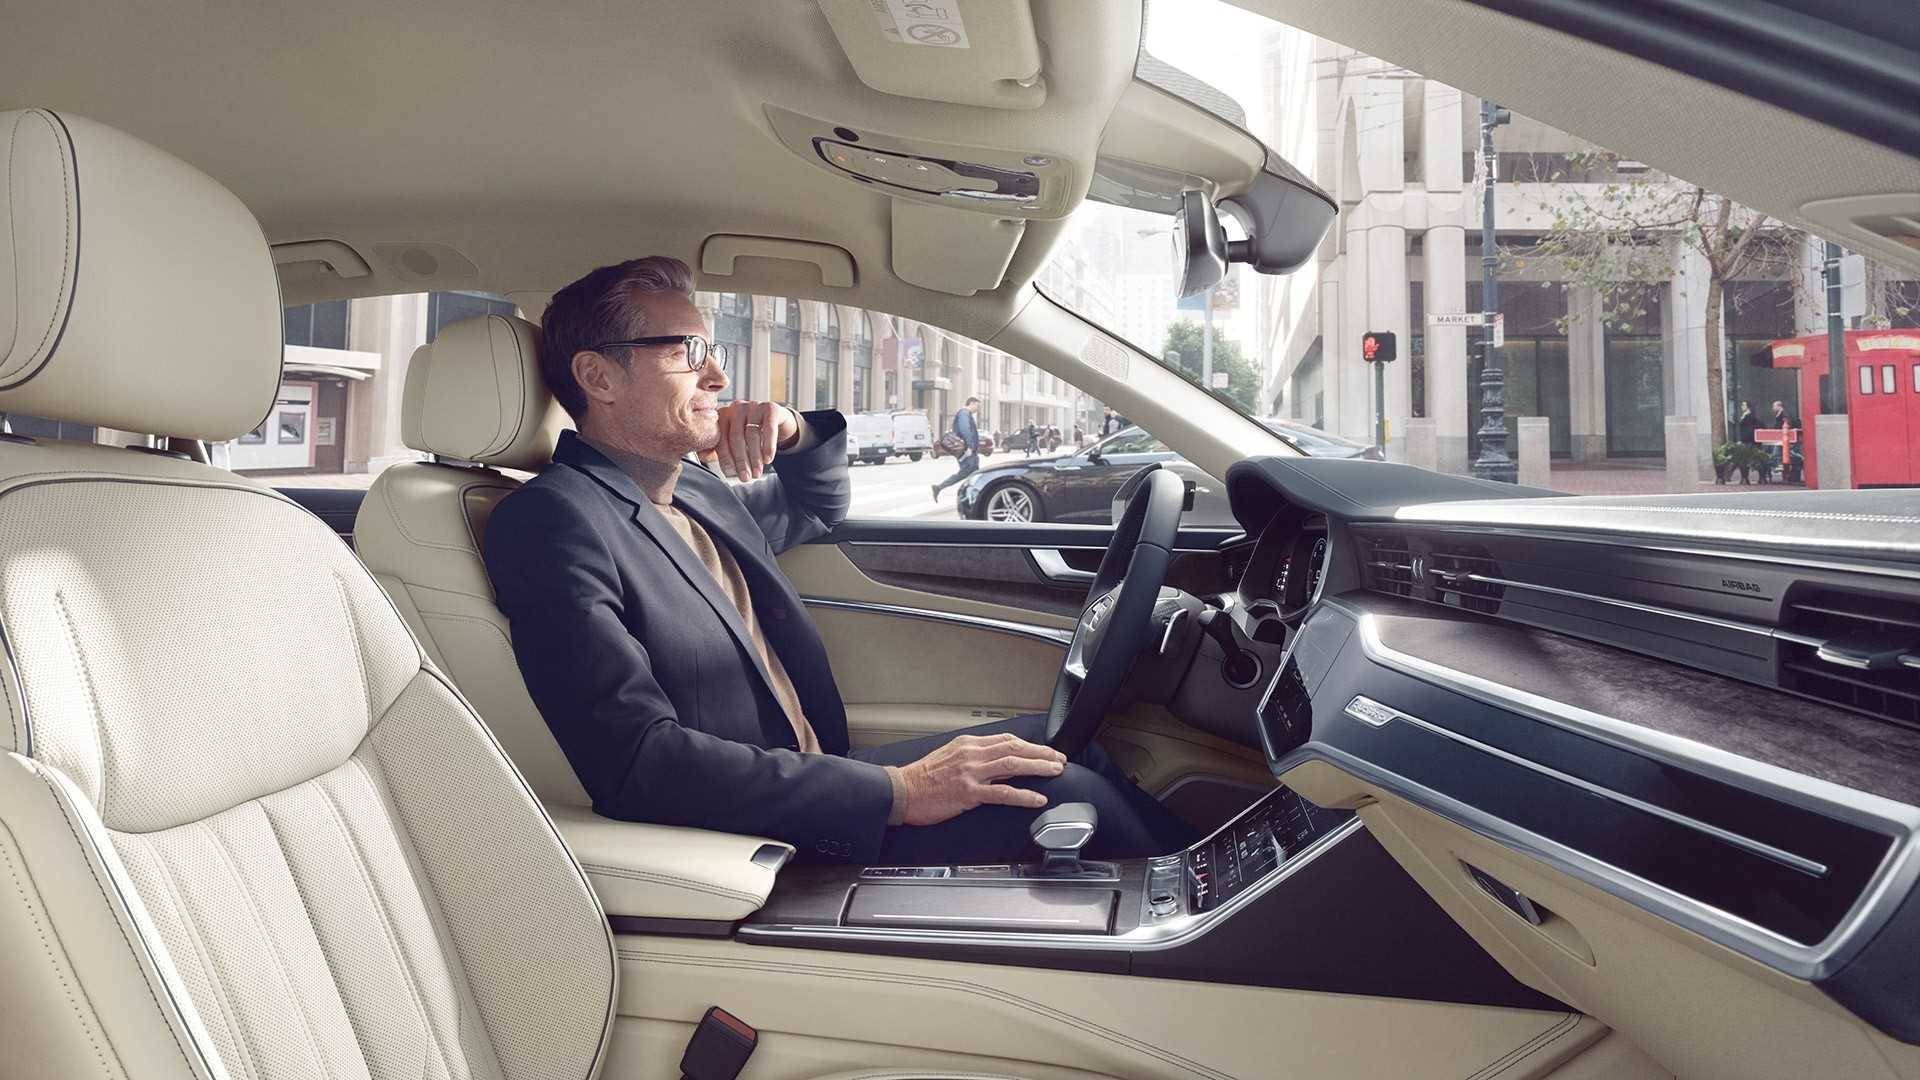 Audi A6 Berline 2018 intérieur beige